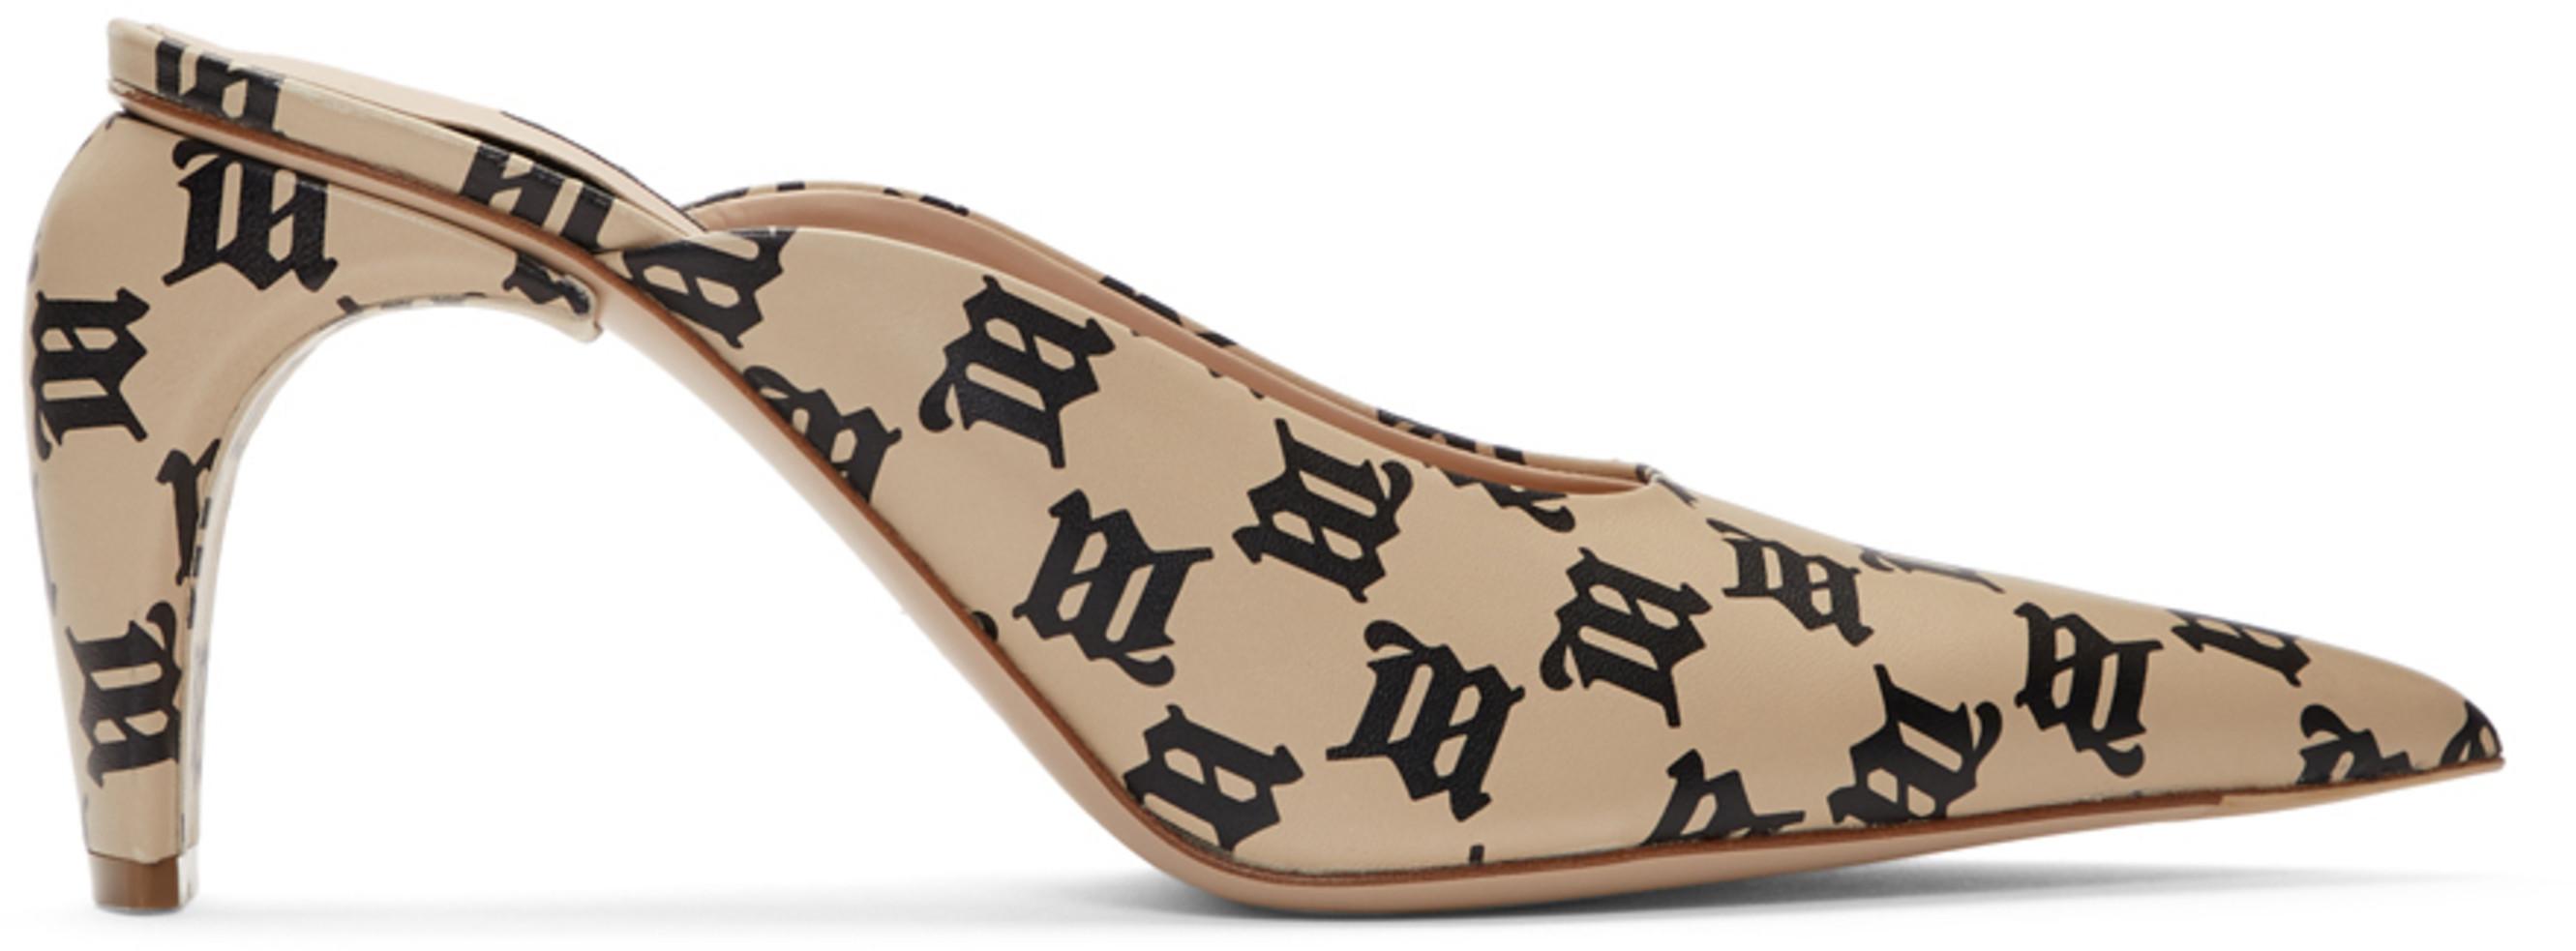 1bb1d7fb2 Designer shoes for Women